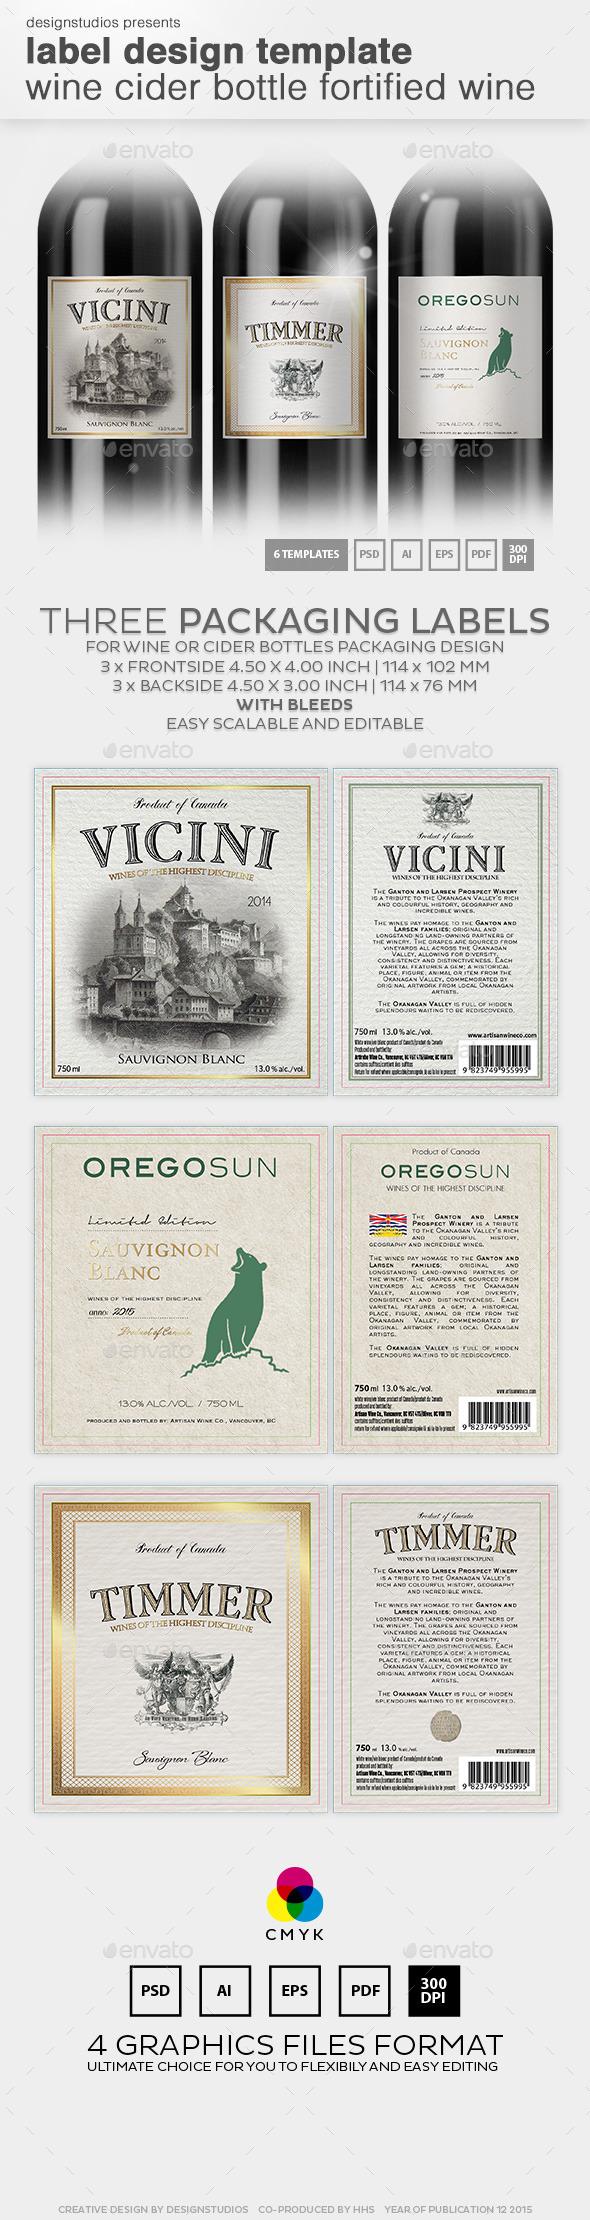 Label Design Template Wine & Cider Bottle - Packaging Print Templates